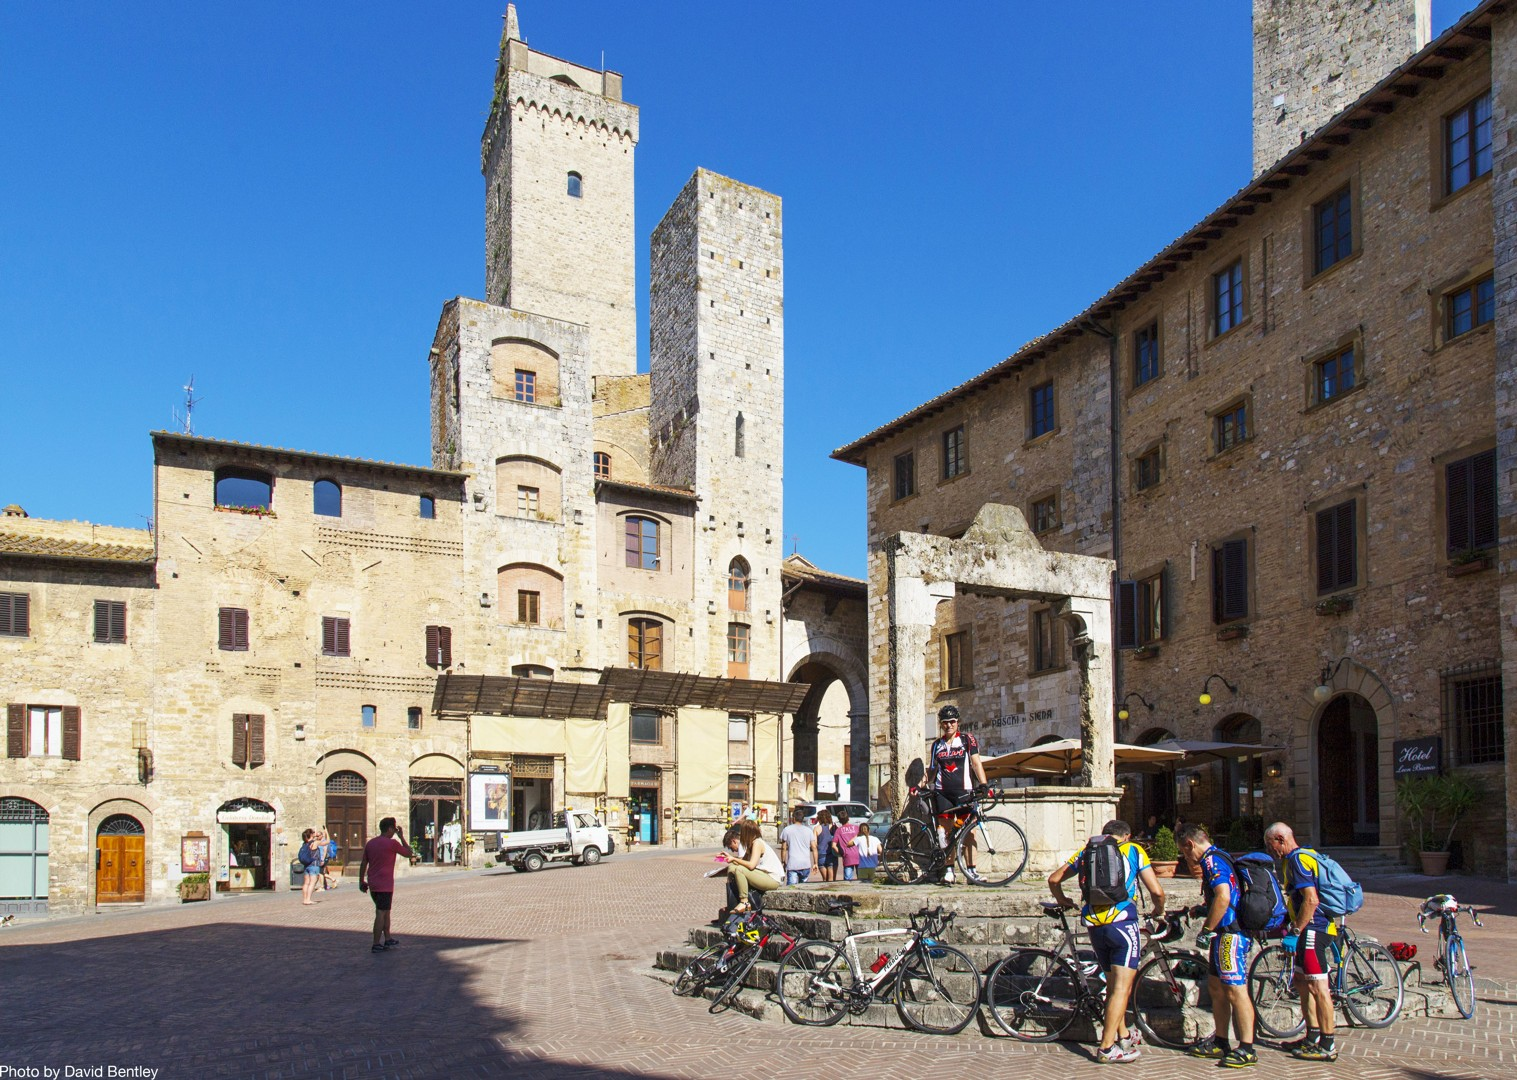 tuscany-self-guided-road-cycling.jpg - Italy - Tuscany Tourer - Self Guided Road Cycling Holiday - Road Cycling